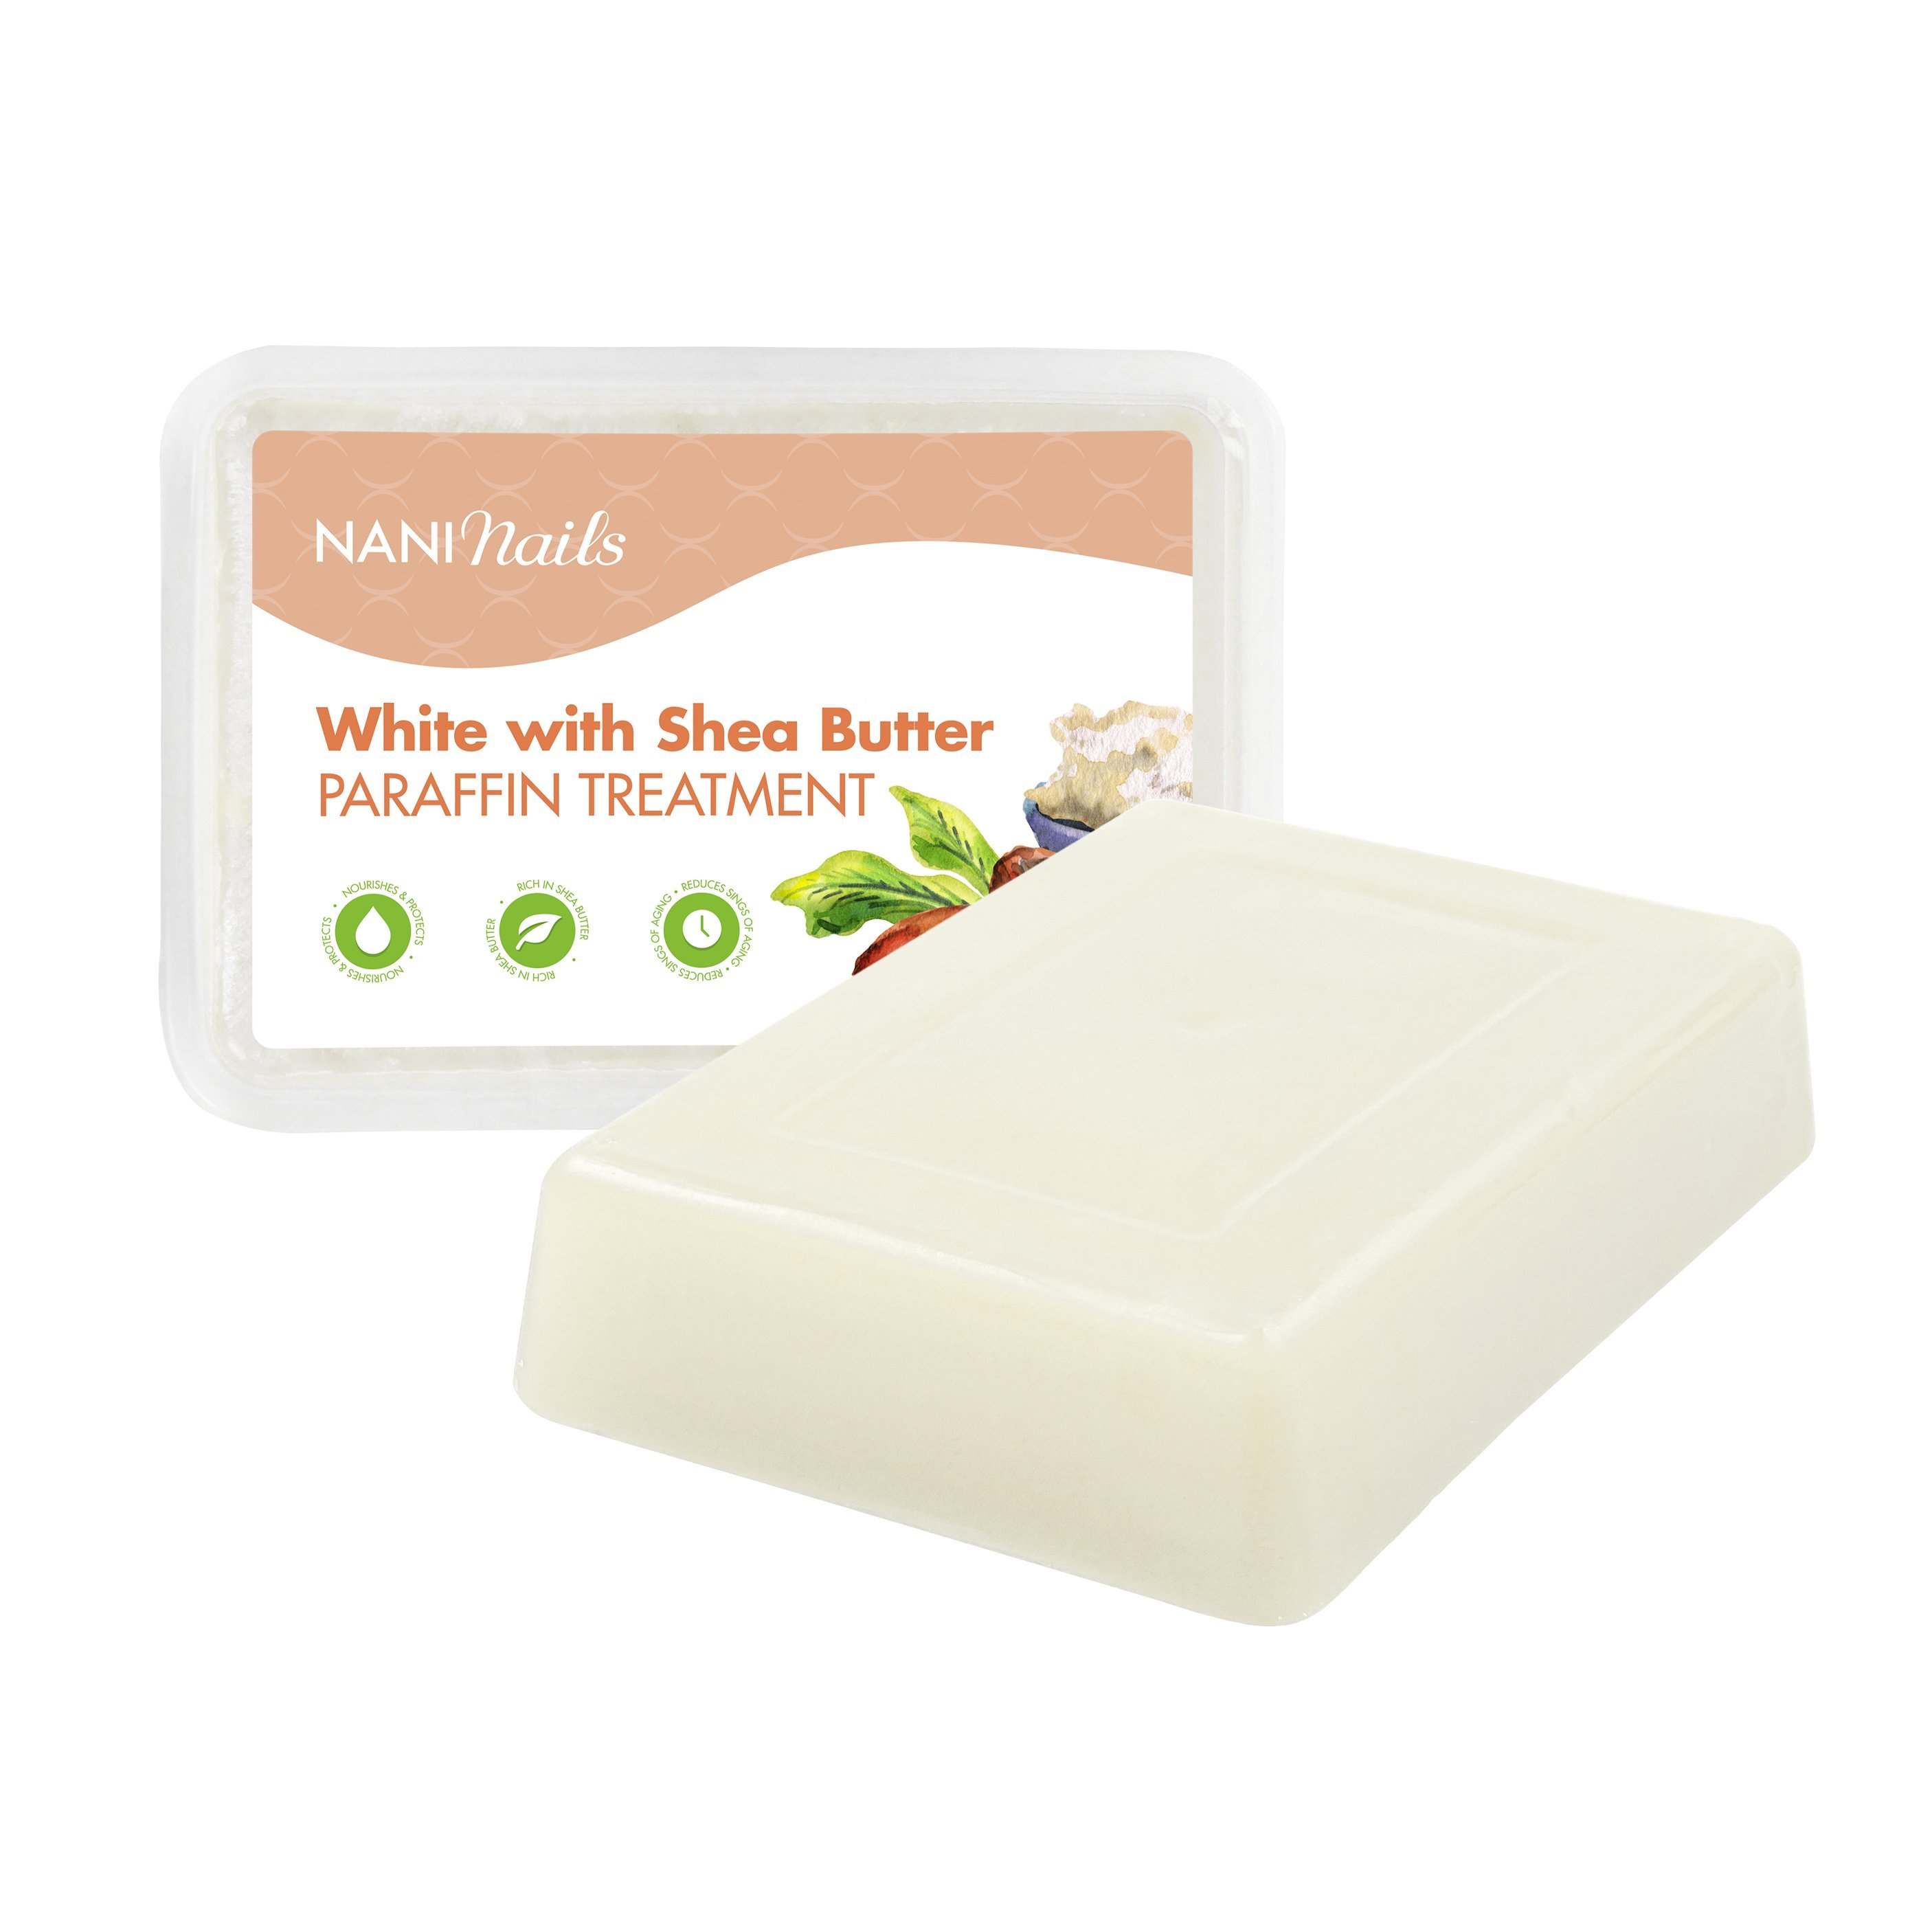 NANI kozmetický parafín 500 g - White with Shea Butter